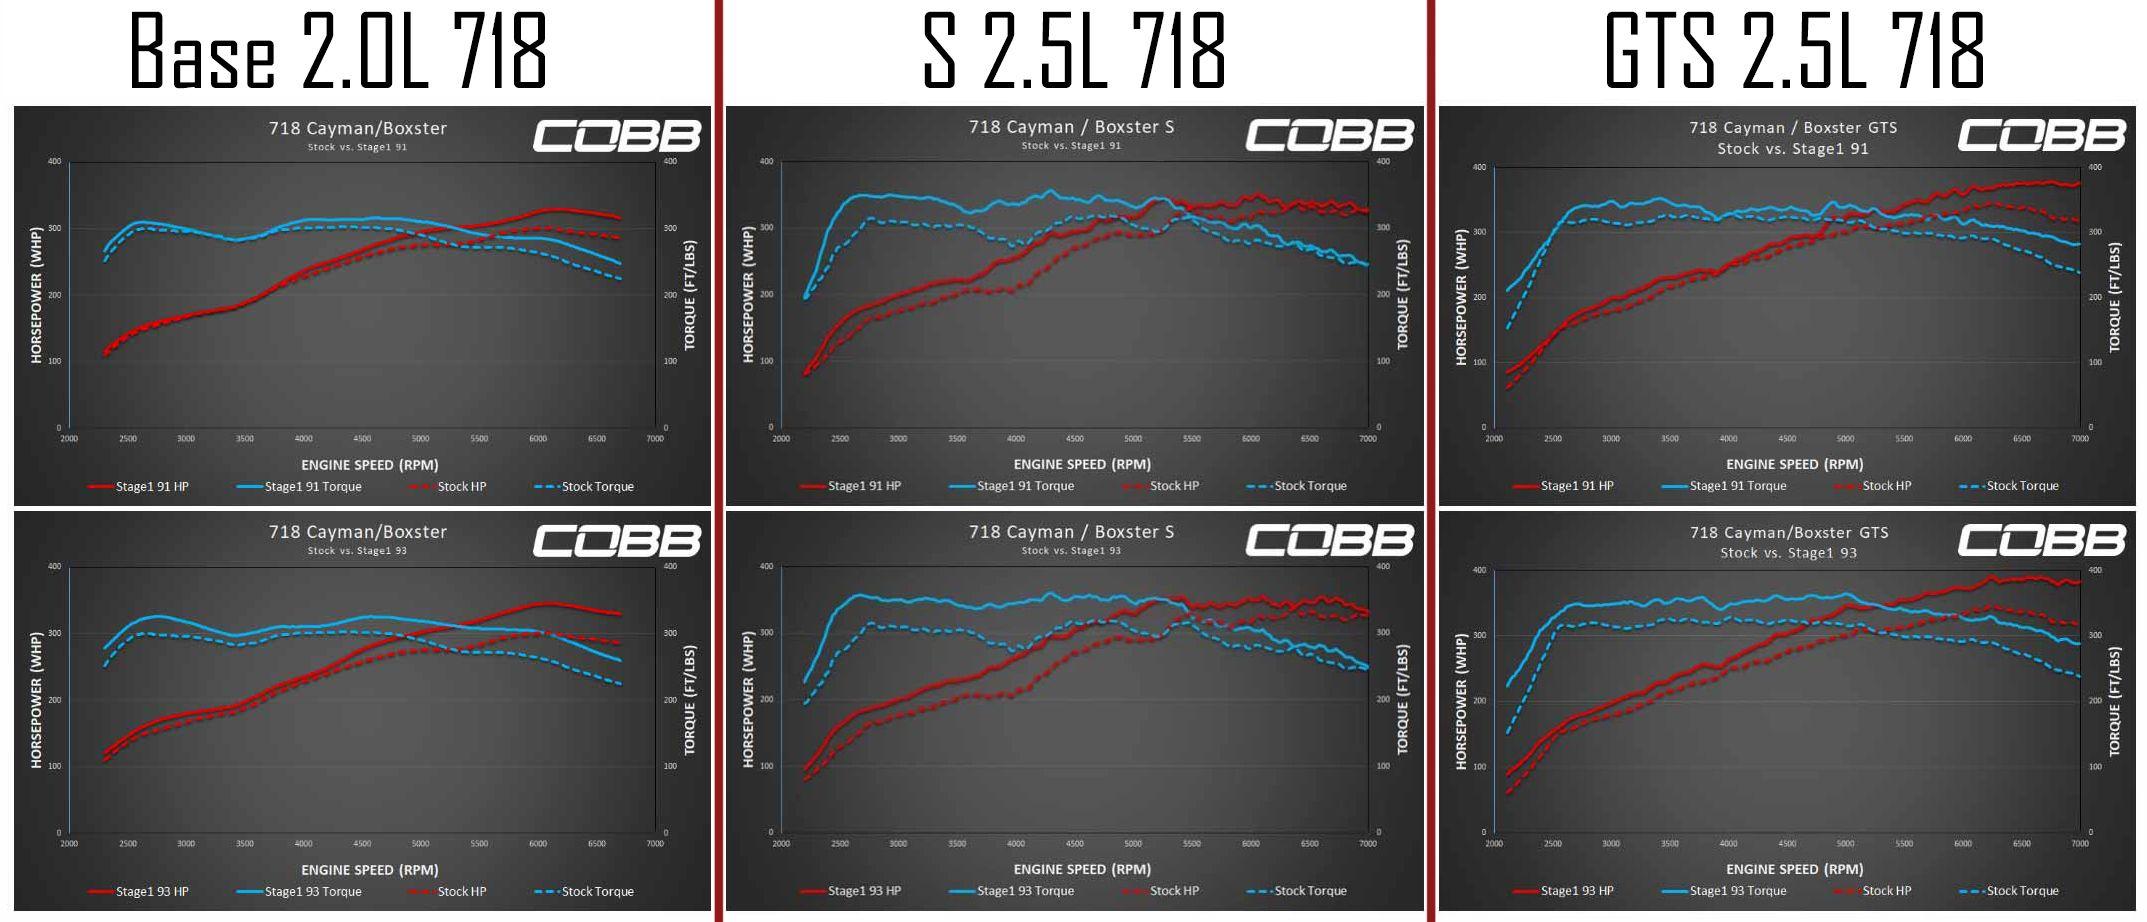 Cobb Accessport V3 Contents for 2017+ Porsche 718 Cayman/Boxster